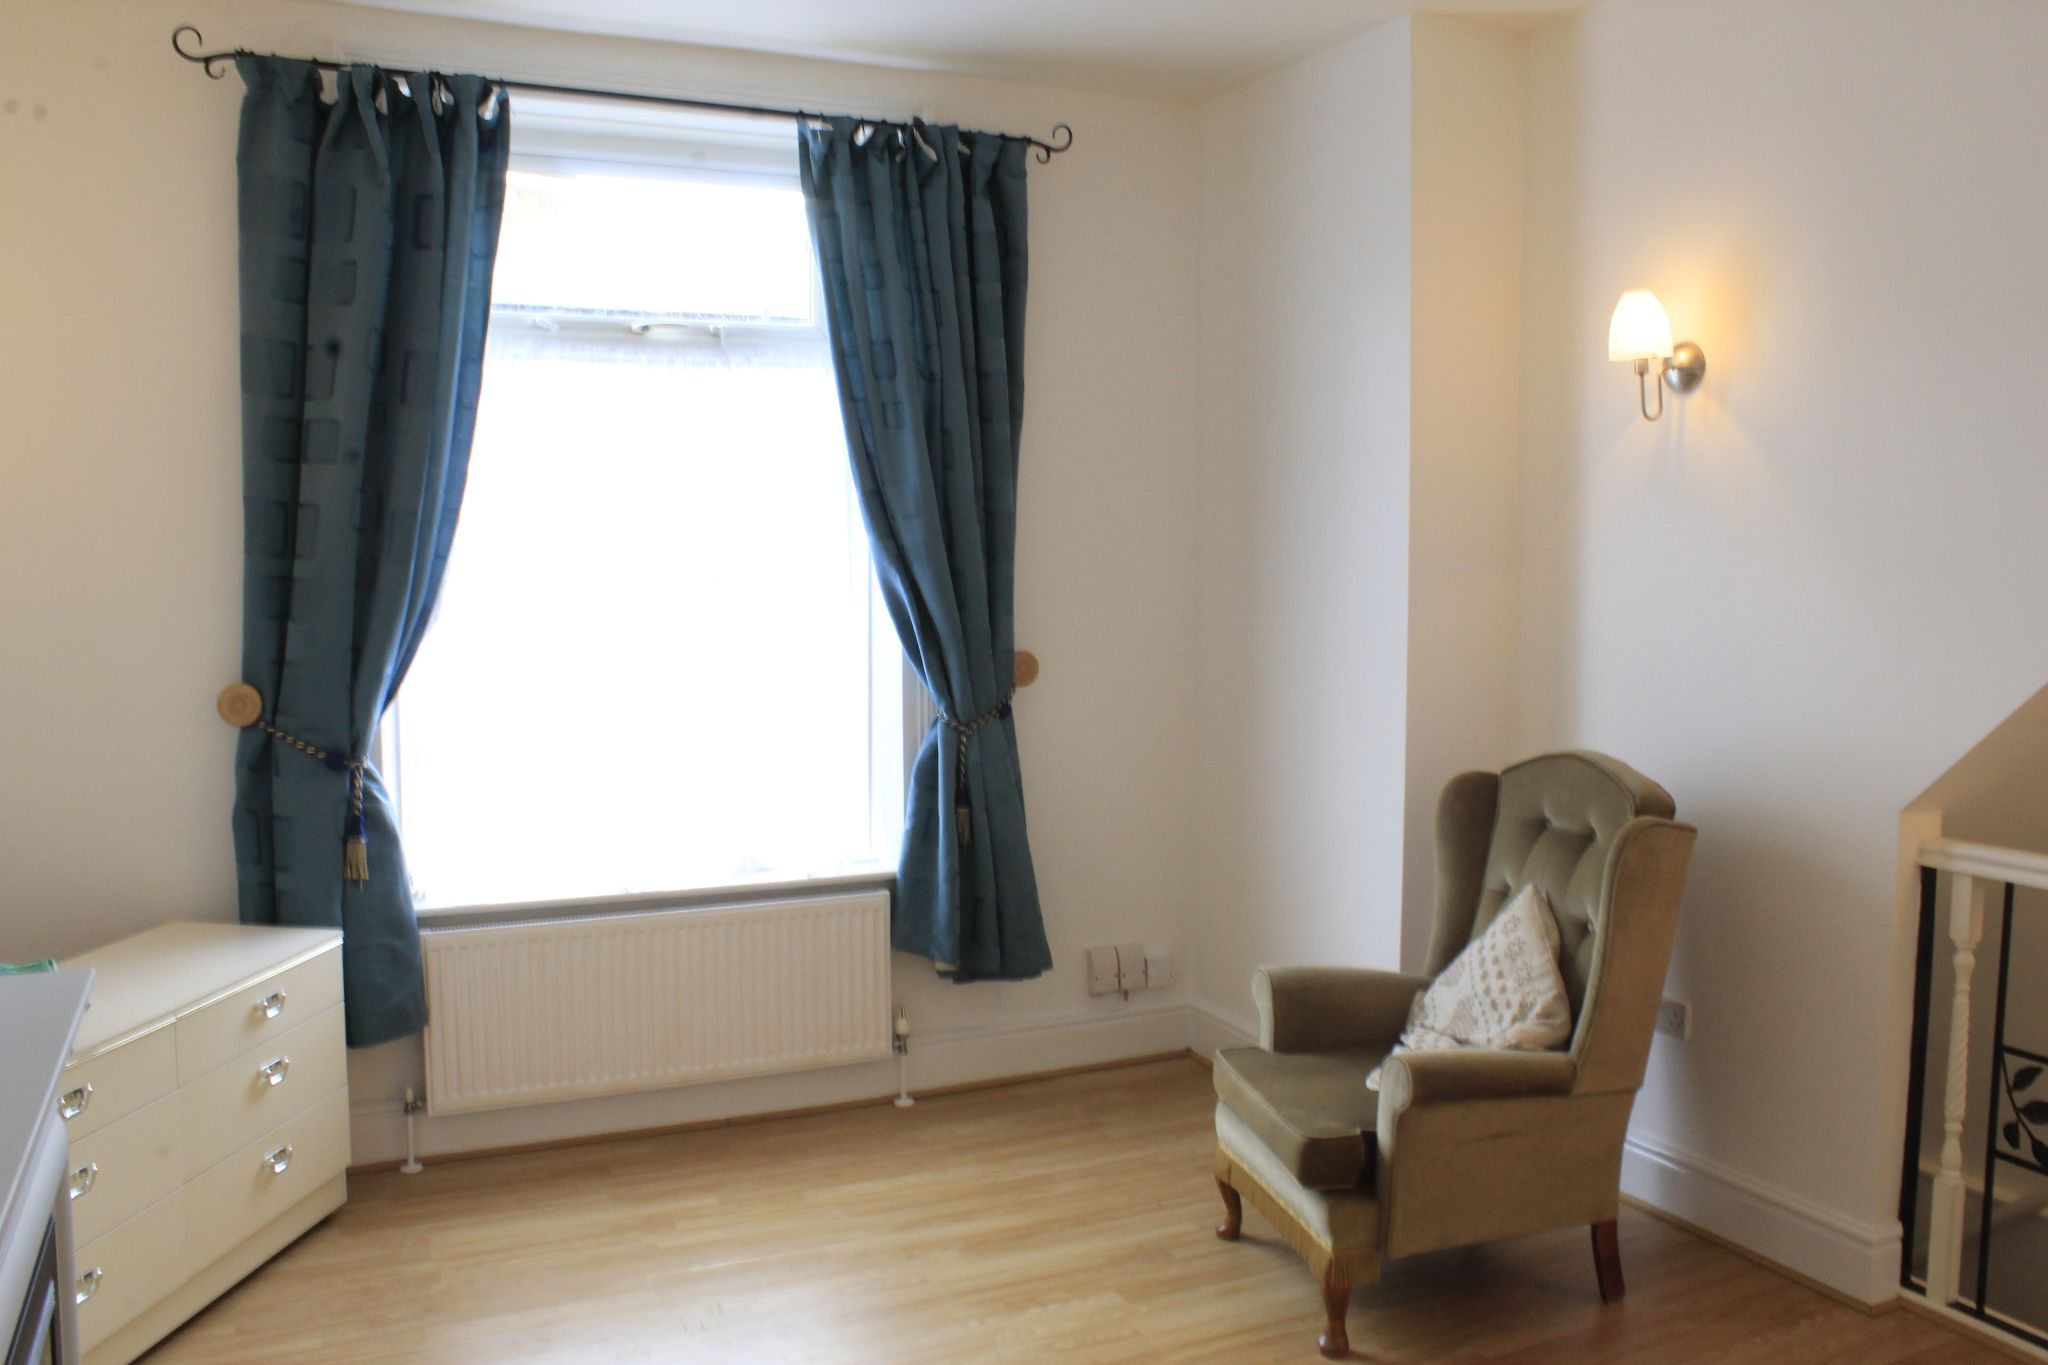 1 bedroom maisonette flat/apartment To Let in Huddersfield - Living room / bedroom